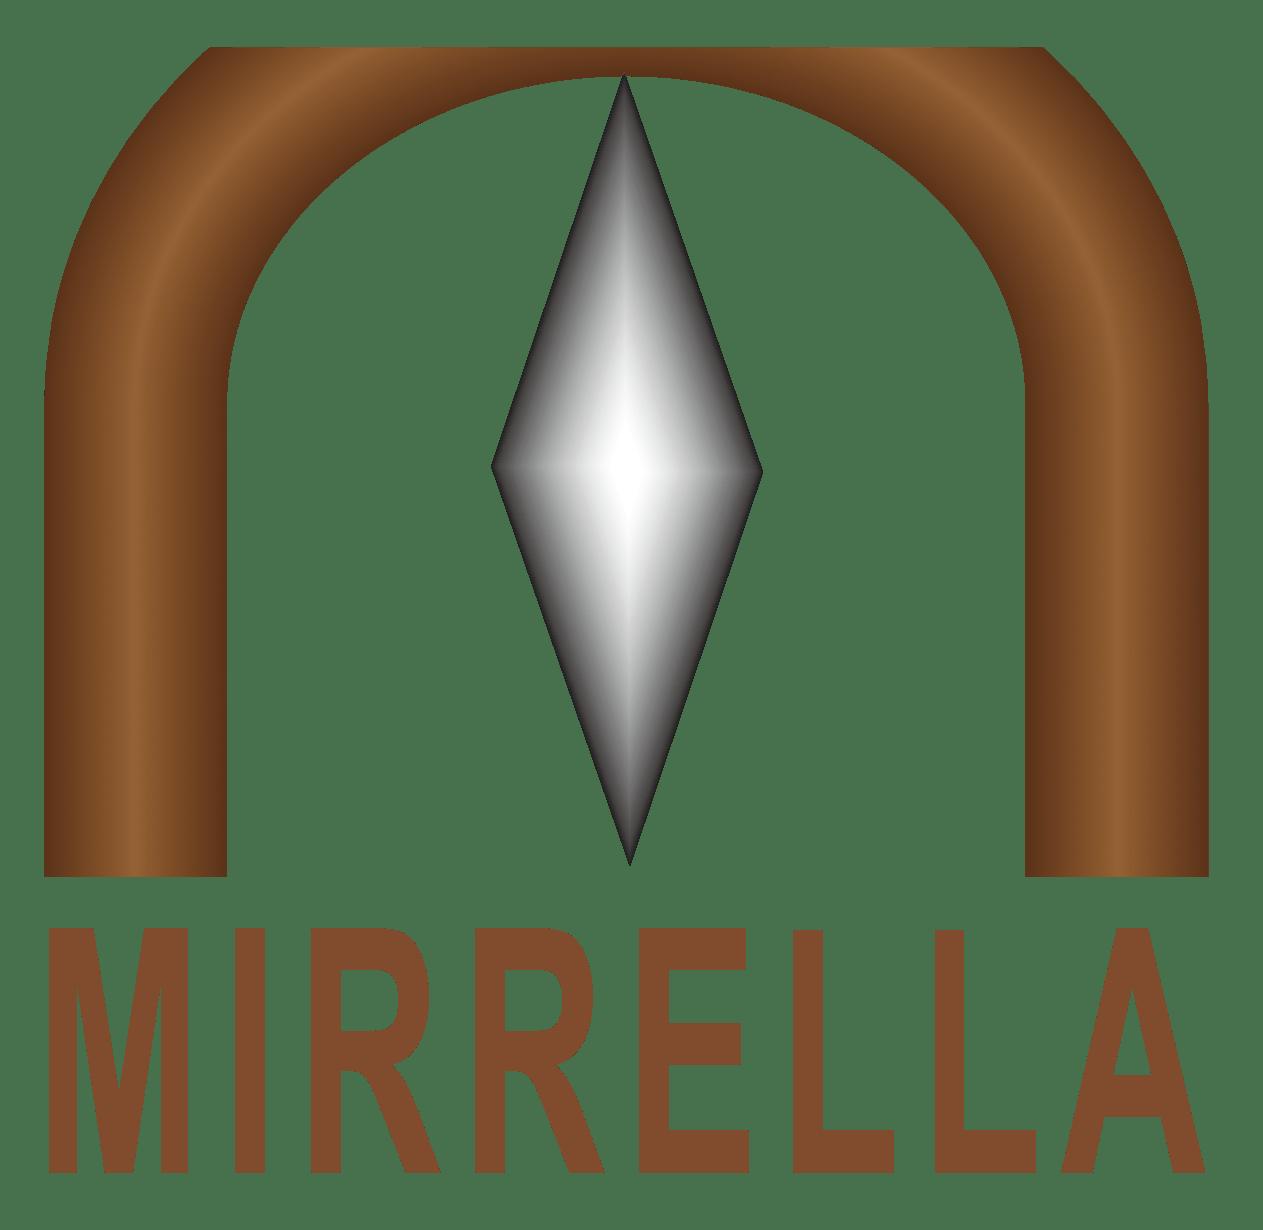 Mirrella